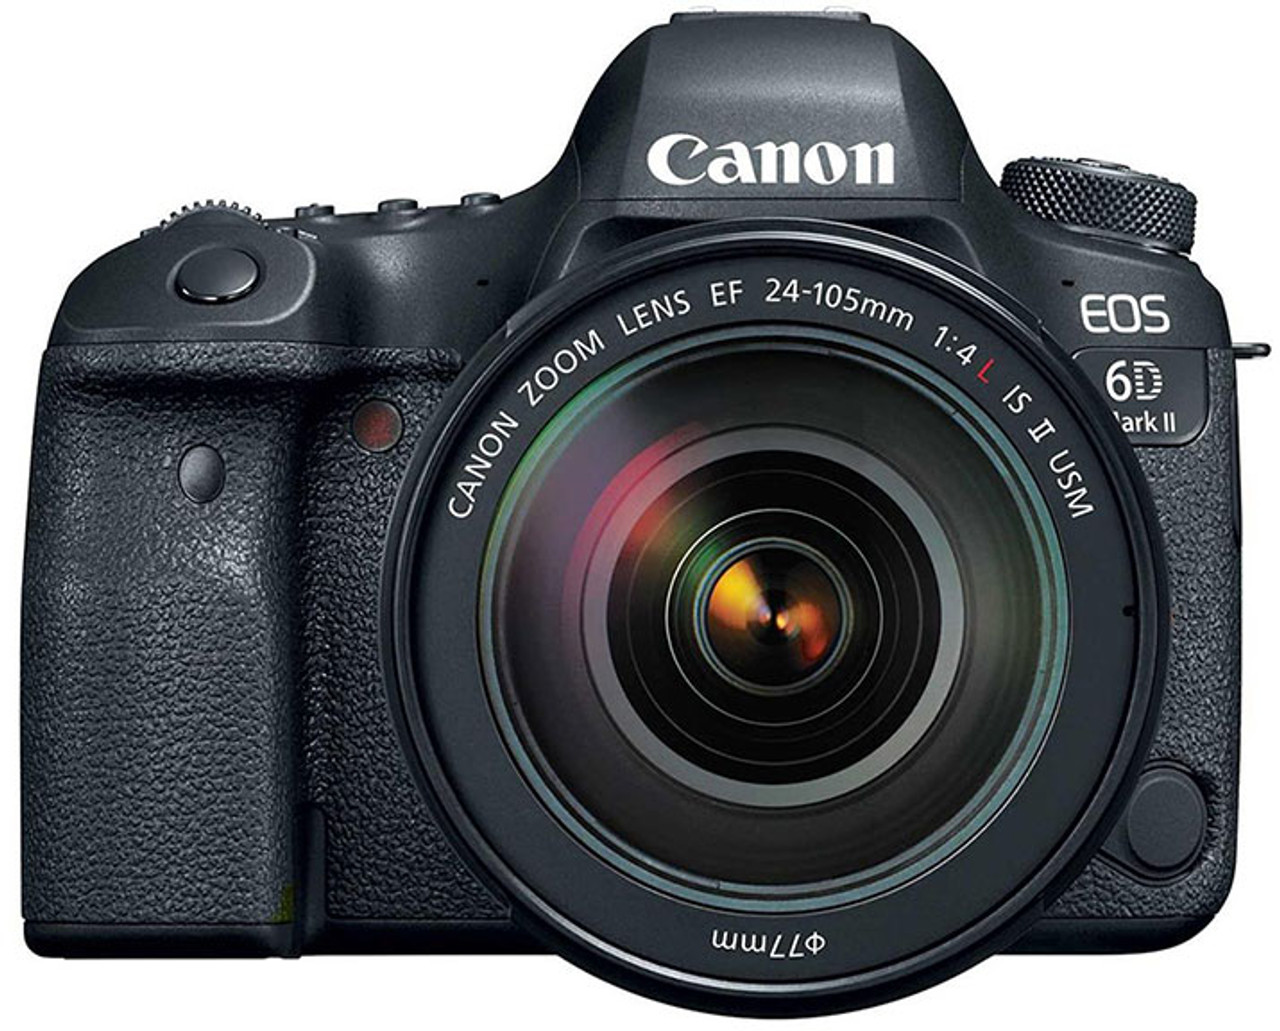 Canon EOS 6D Mark II Digital SLR Camera with EF 24-105mm F4L IS II USM Lens